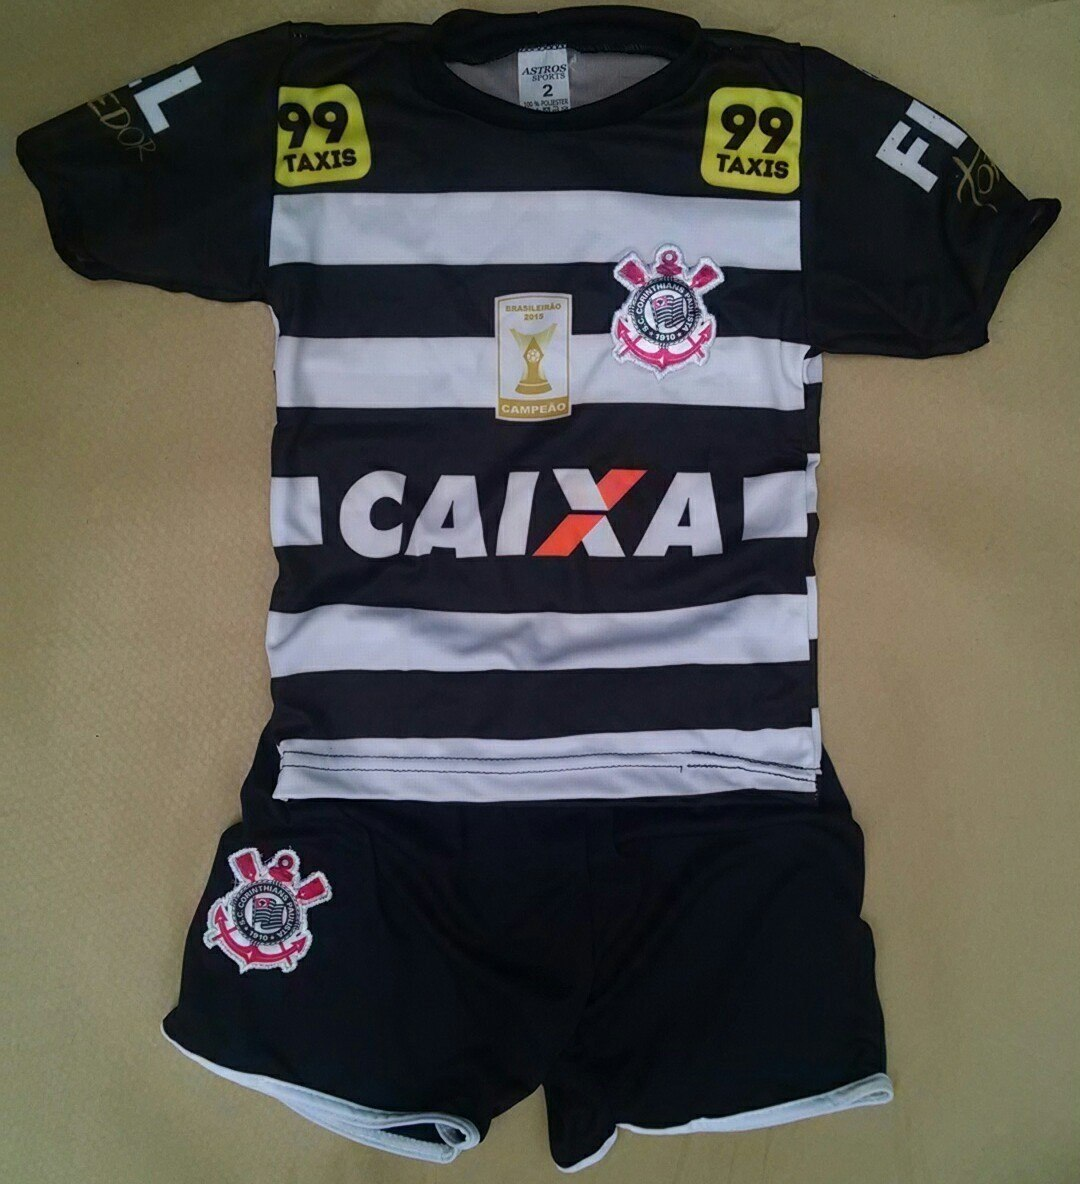 conjunto infantil corinthians shorts e camiseta boa qualidad. Carregando  zoom. 142b35b40af2b